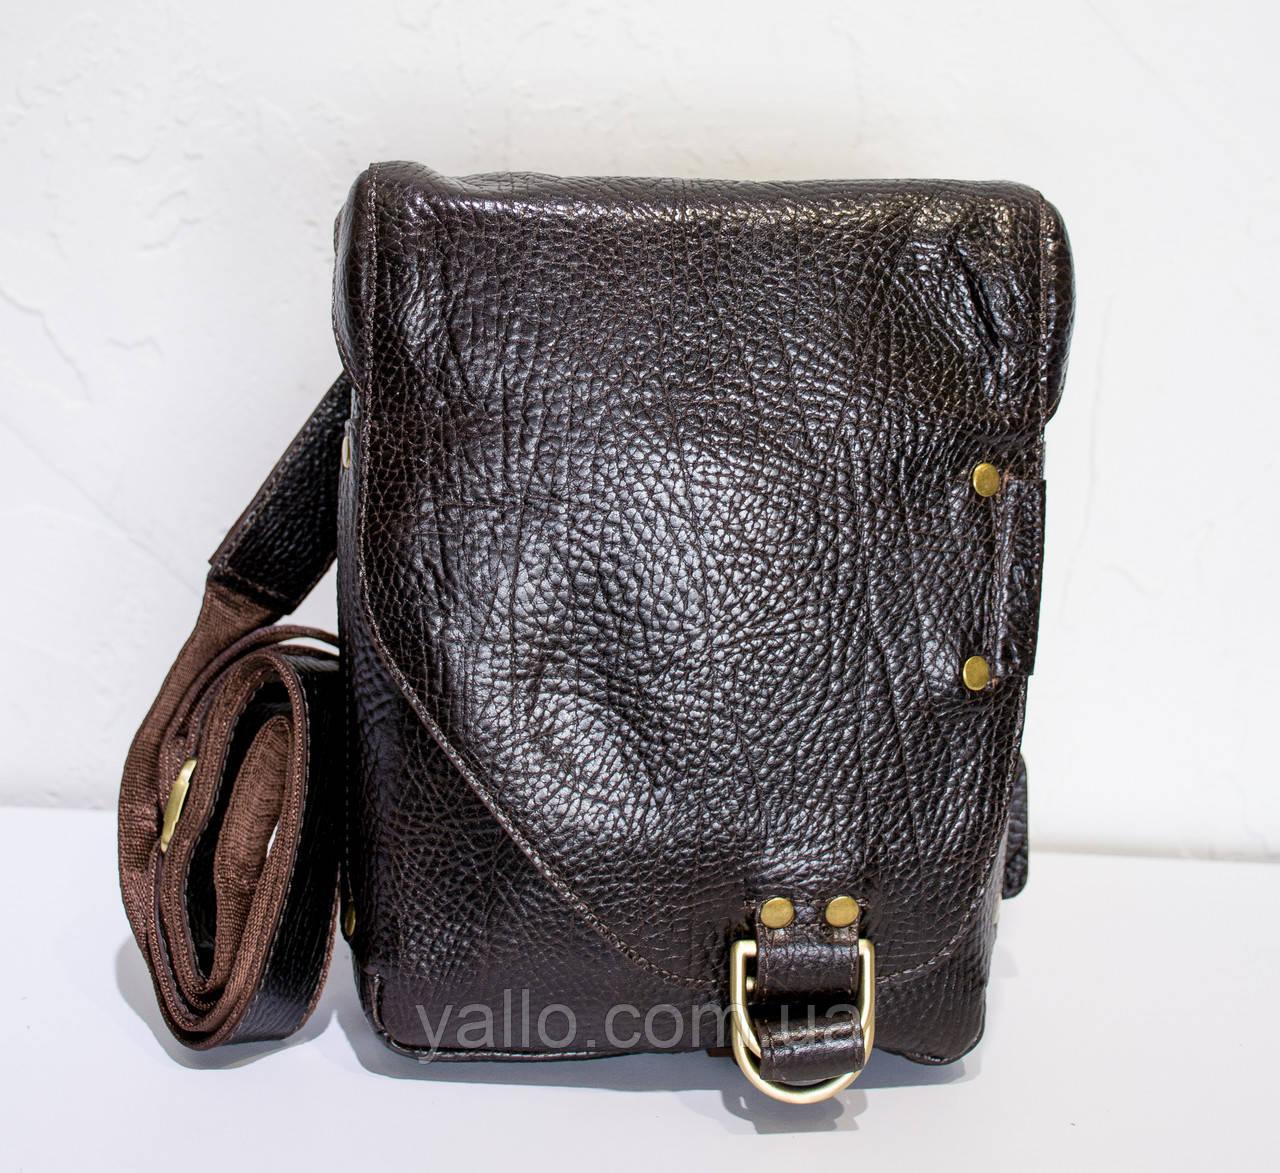 Натуральная кожаная сумка для мужчин Tony Bellucci T5079-886